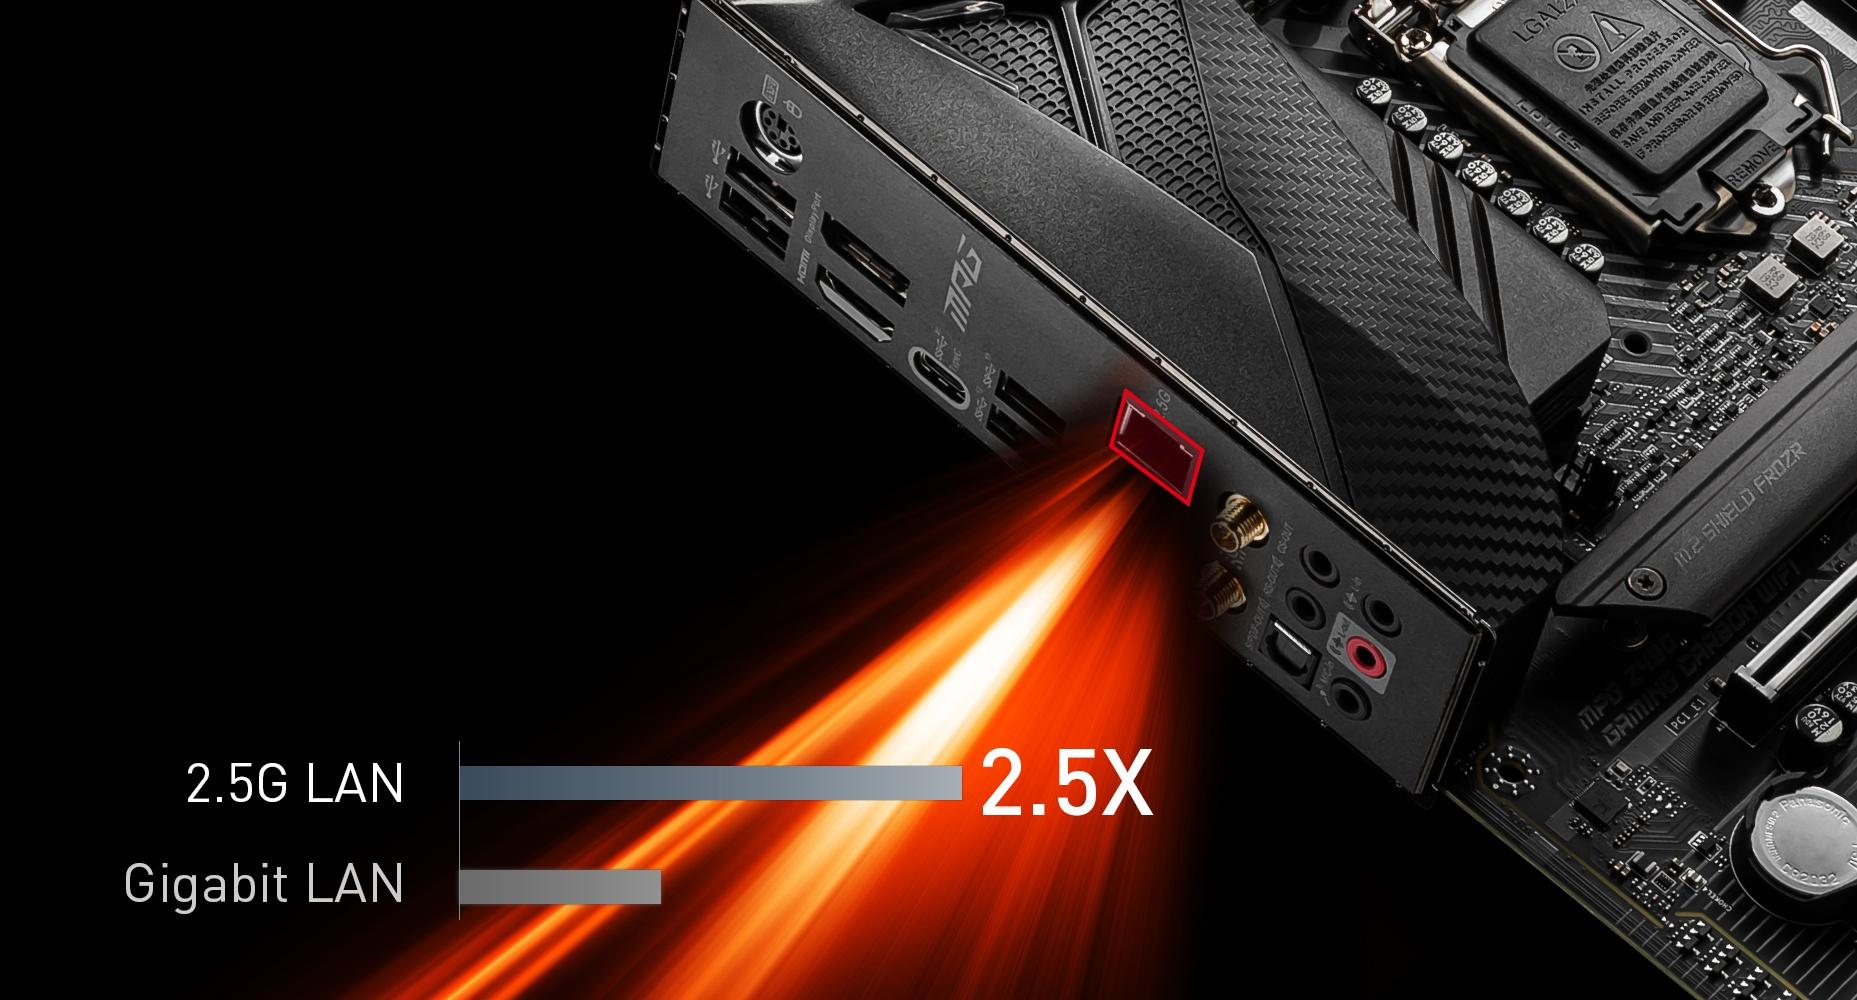 MSI MPG Z490 GAMING CARBON WIFI MAXIMIUM DATA TRANSFER WITH 2.5G LAN